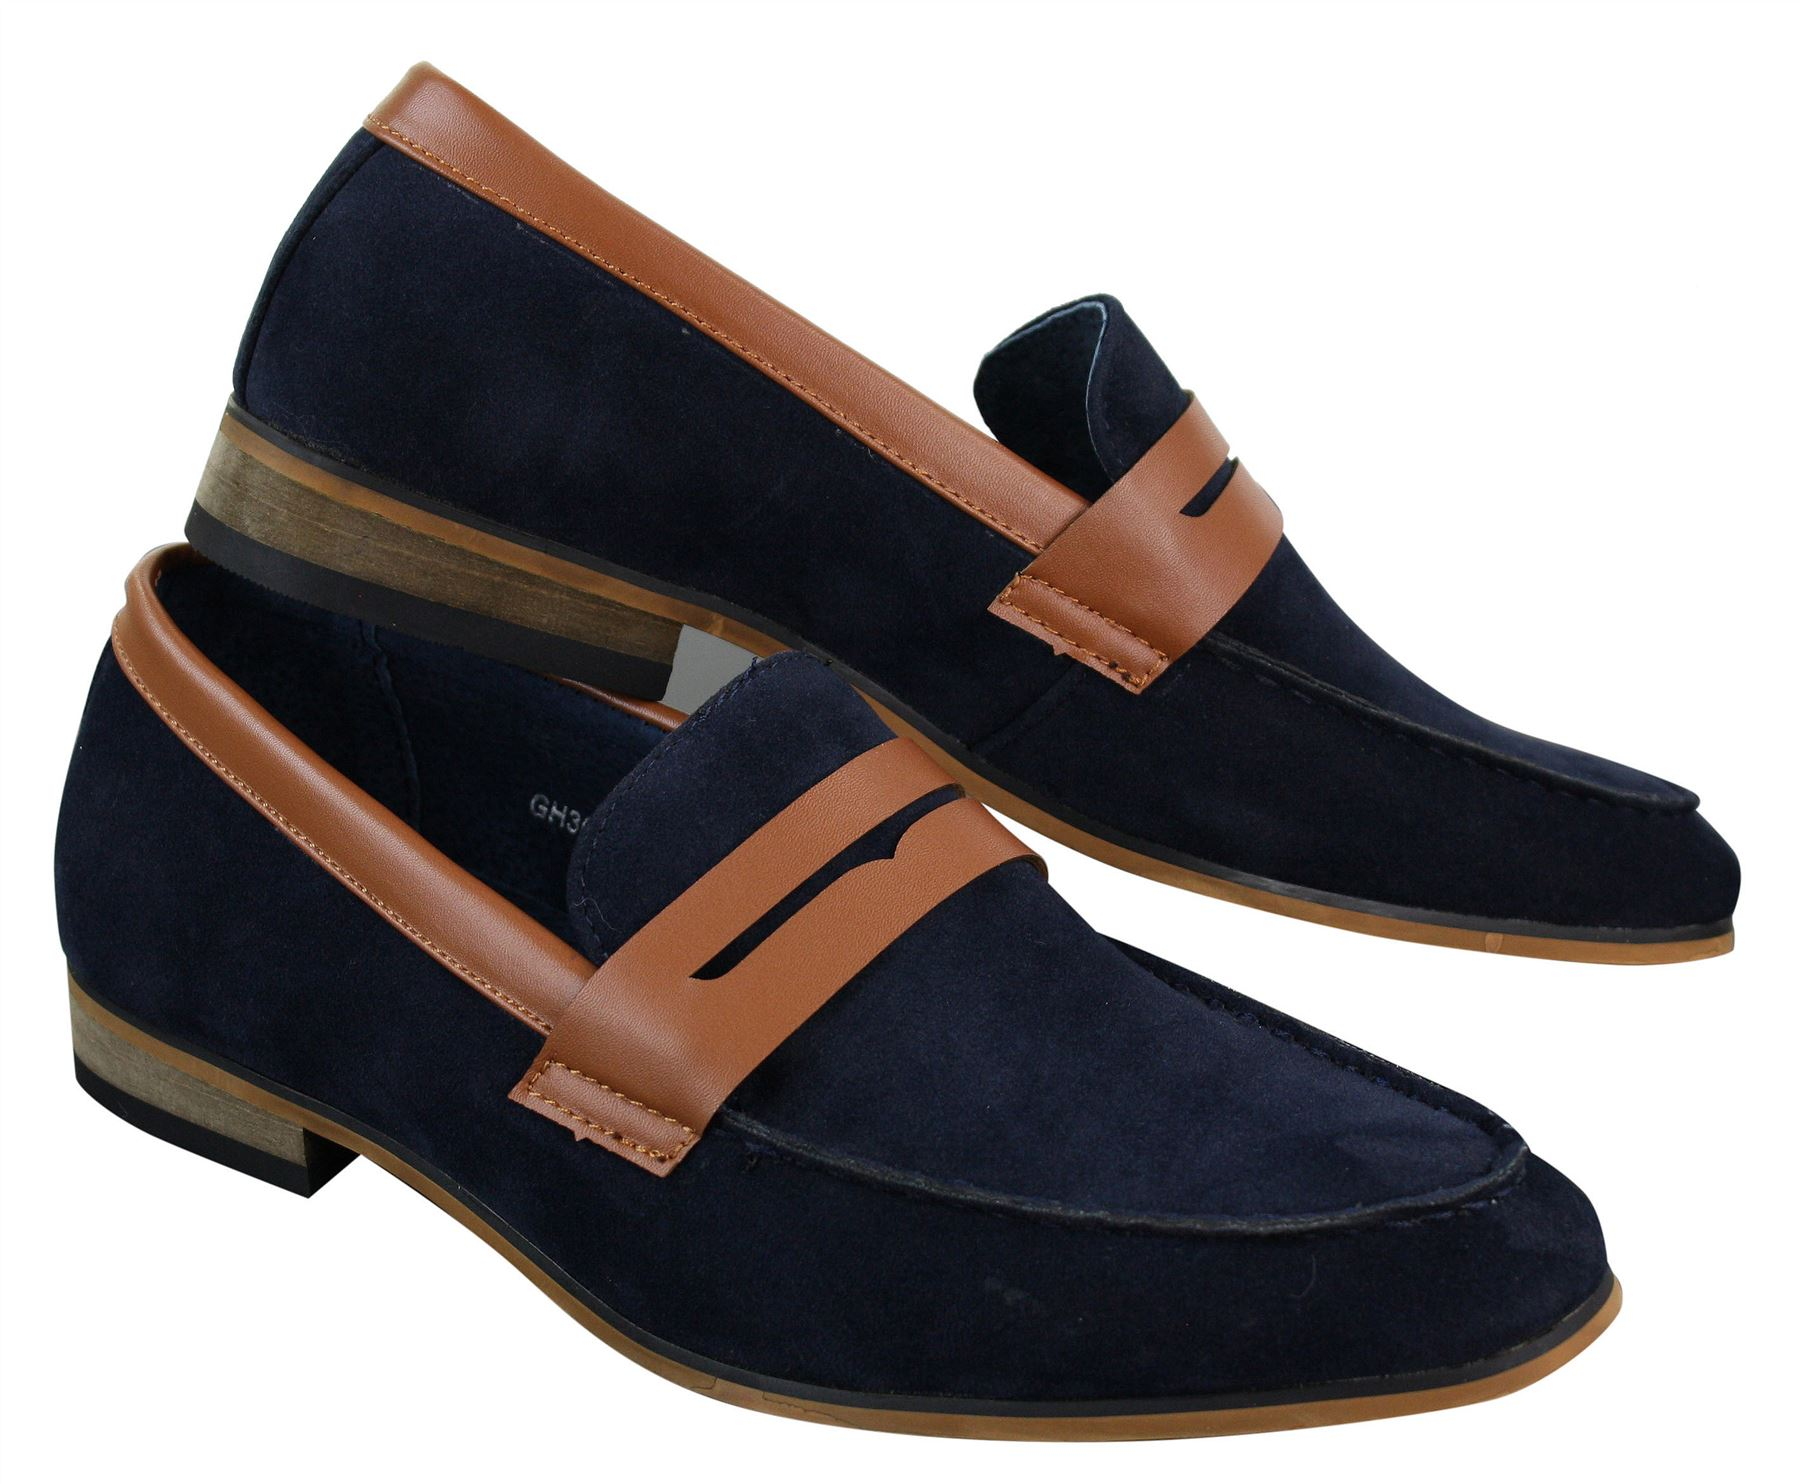 Pelle Senza Scamosciata Da In Lacci Mocassini Uomo Vintage Stile Eleganti 8qIxwR4